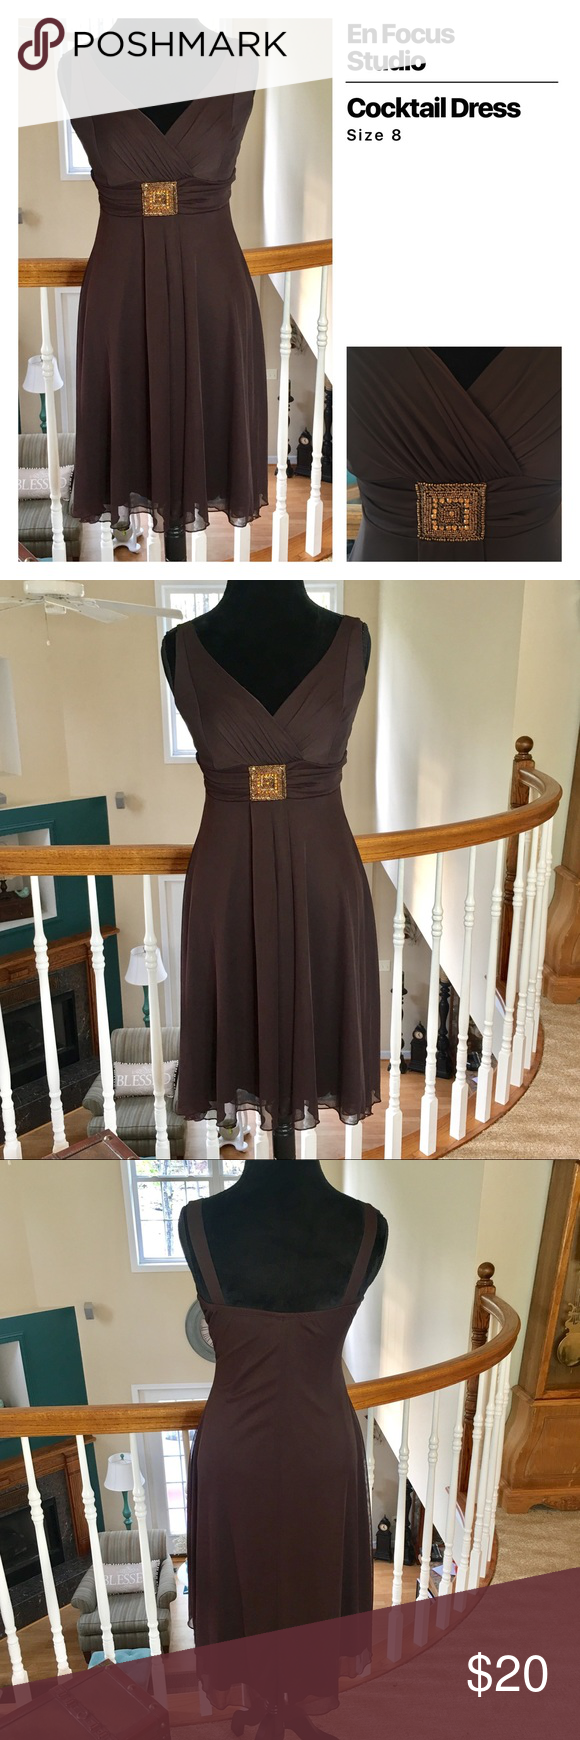 En Focus Studio Cocktail Dress | Chocolate brown, Bodice and Studio